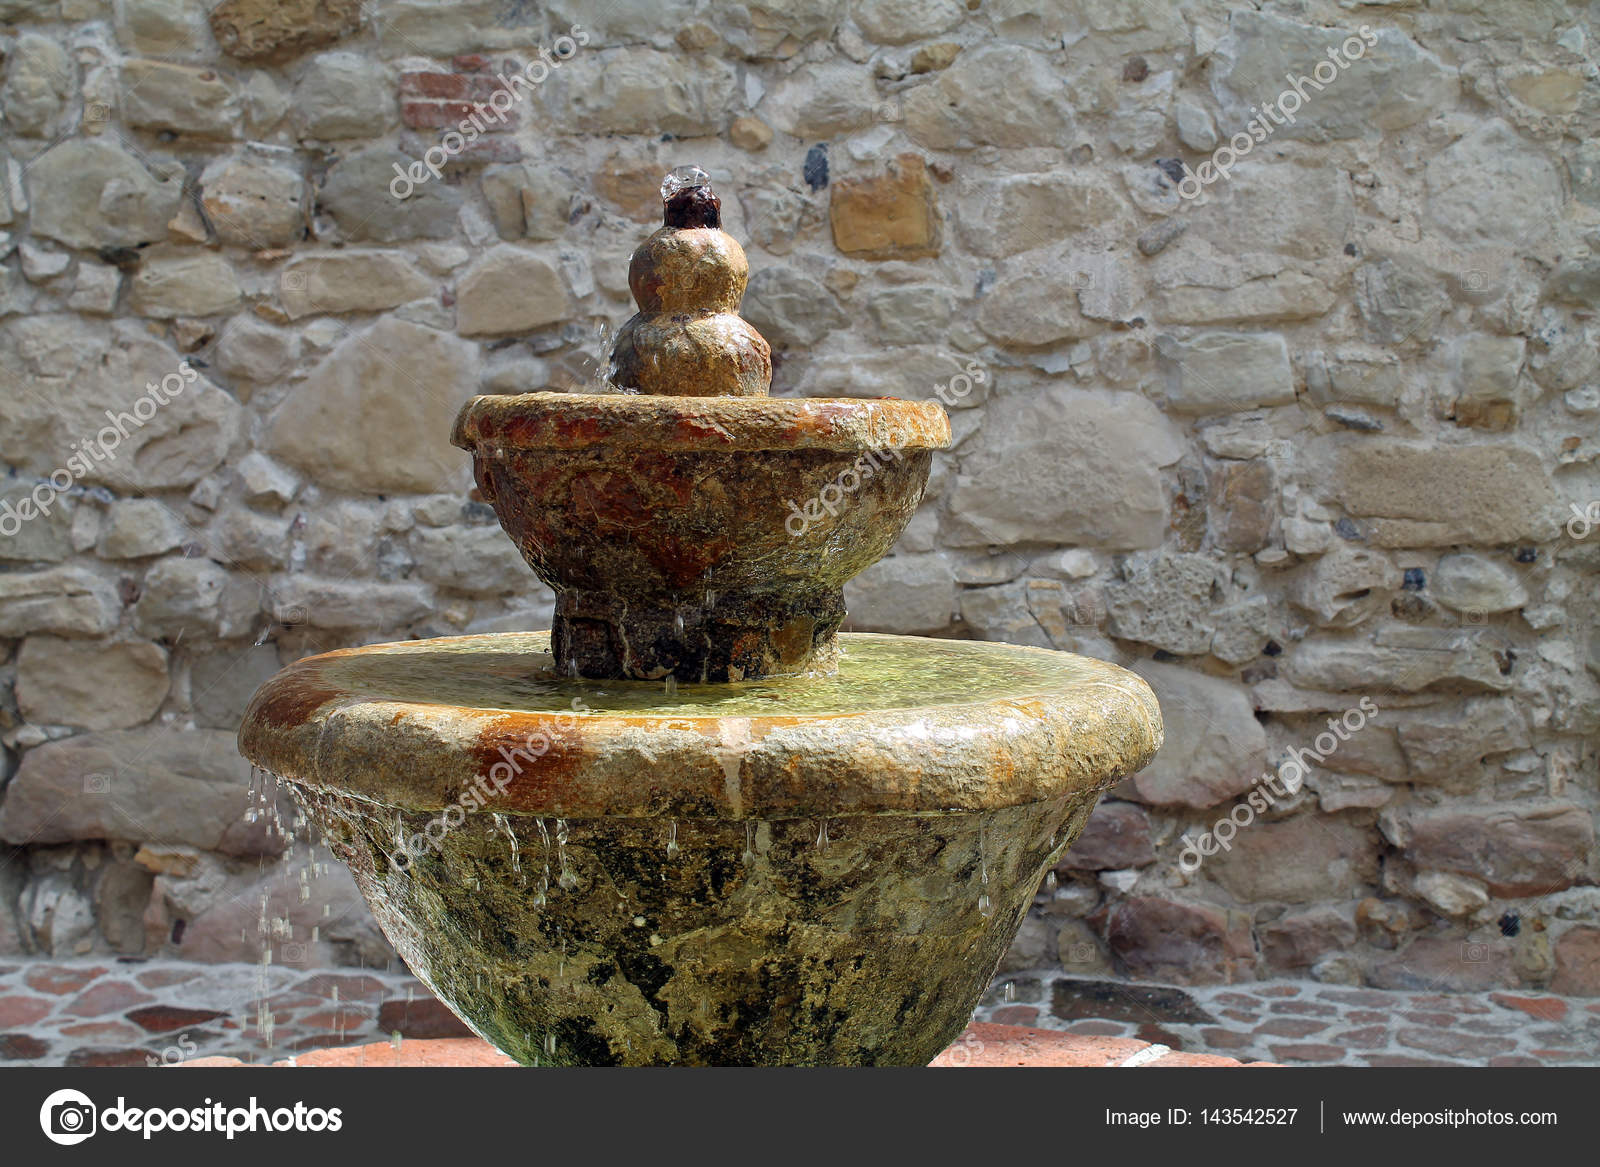 Fontana Giardino Pietra : Fontana di pietra del giardino u2014 foto stock © thelmaelaine #143542527